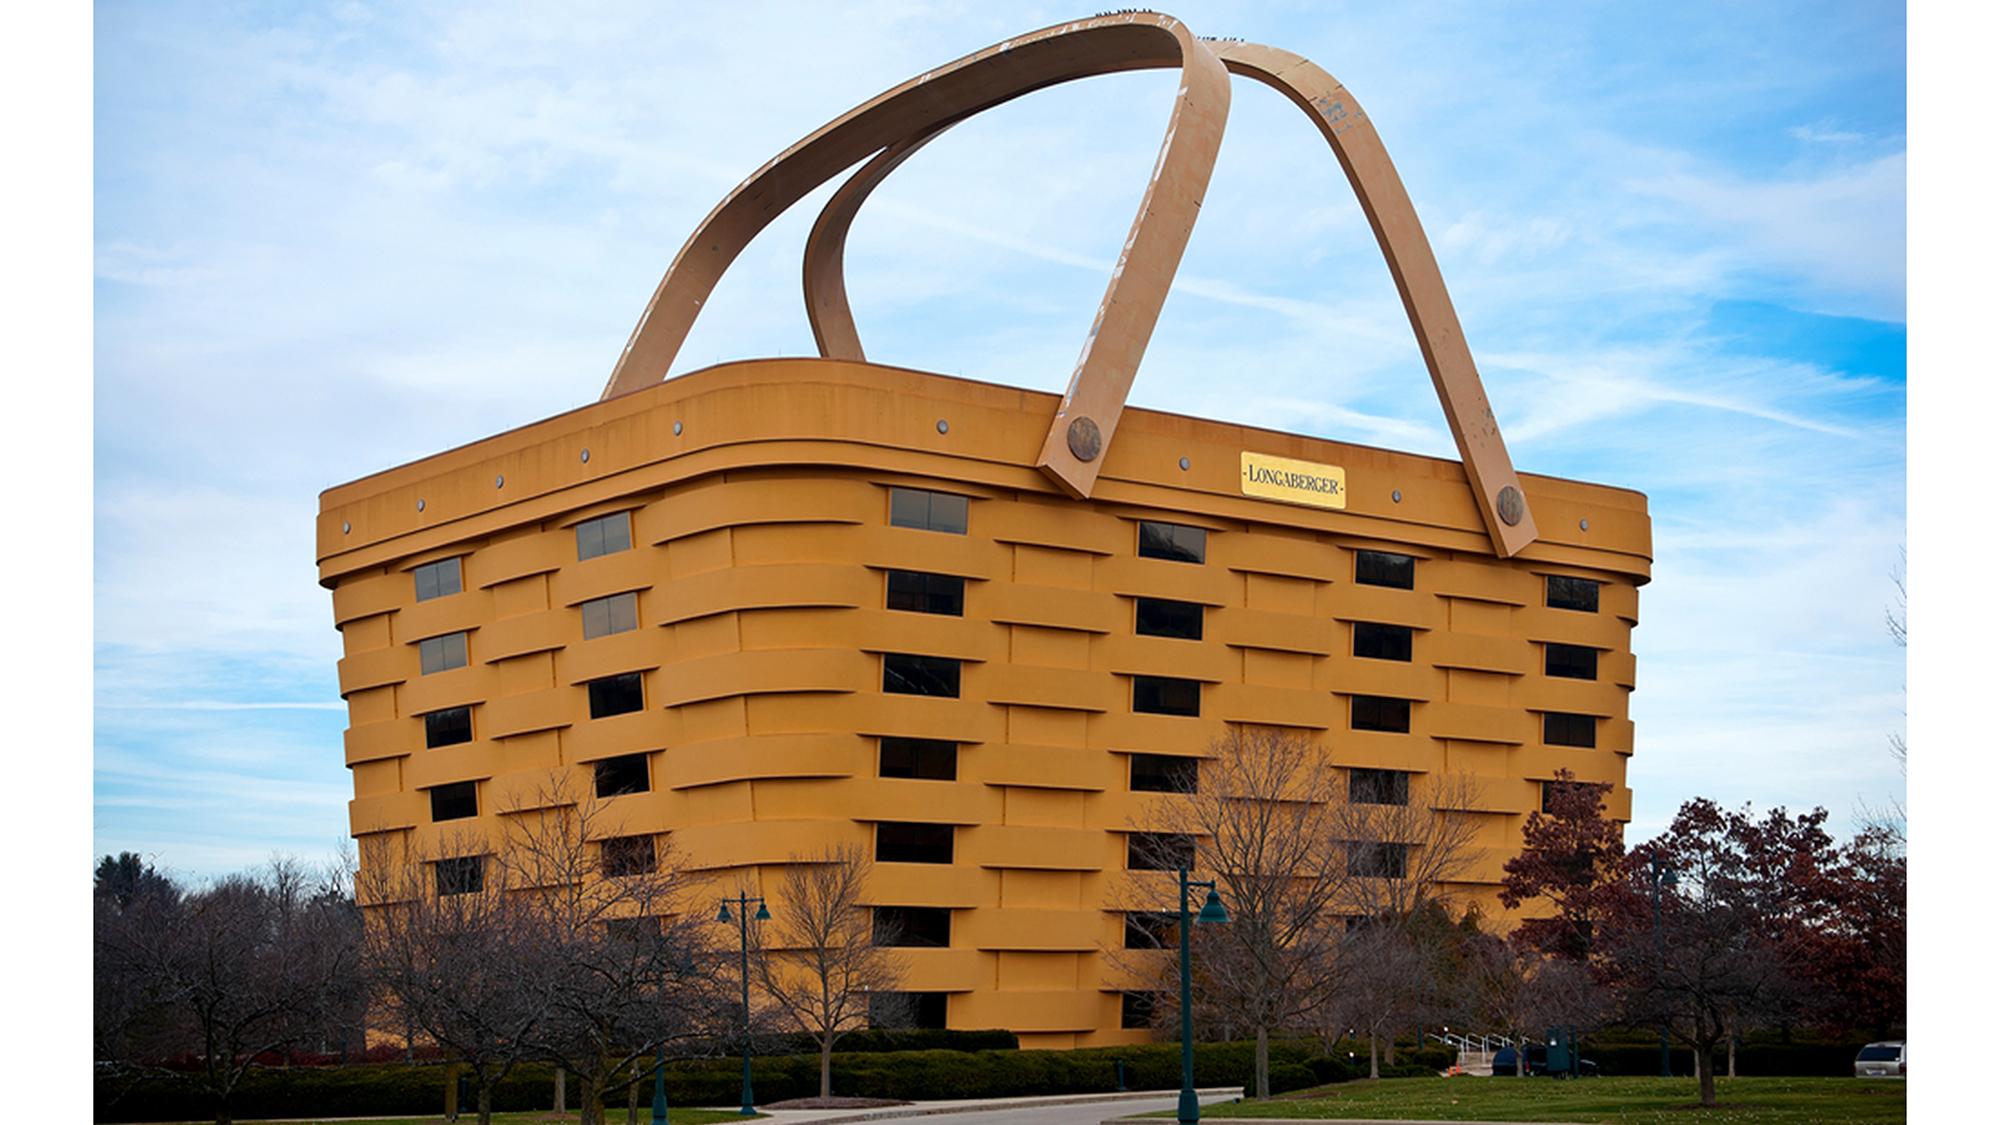 Friday Funny Picnic Basket Building For Sale Planetizen